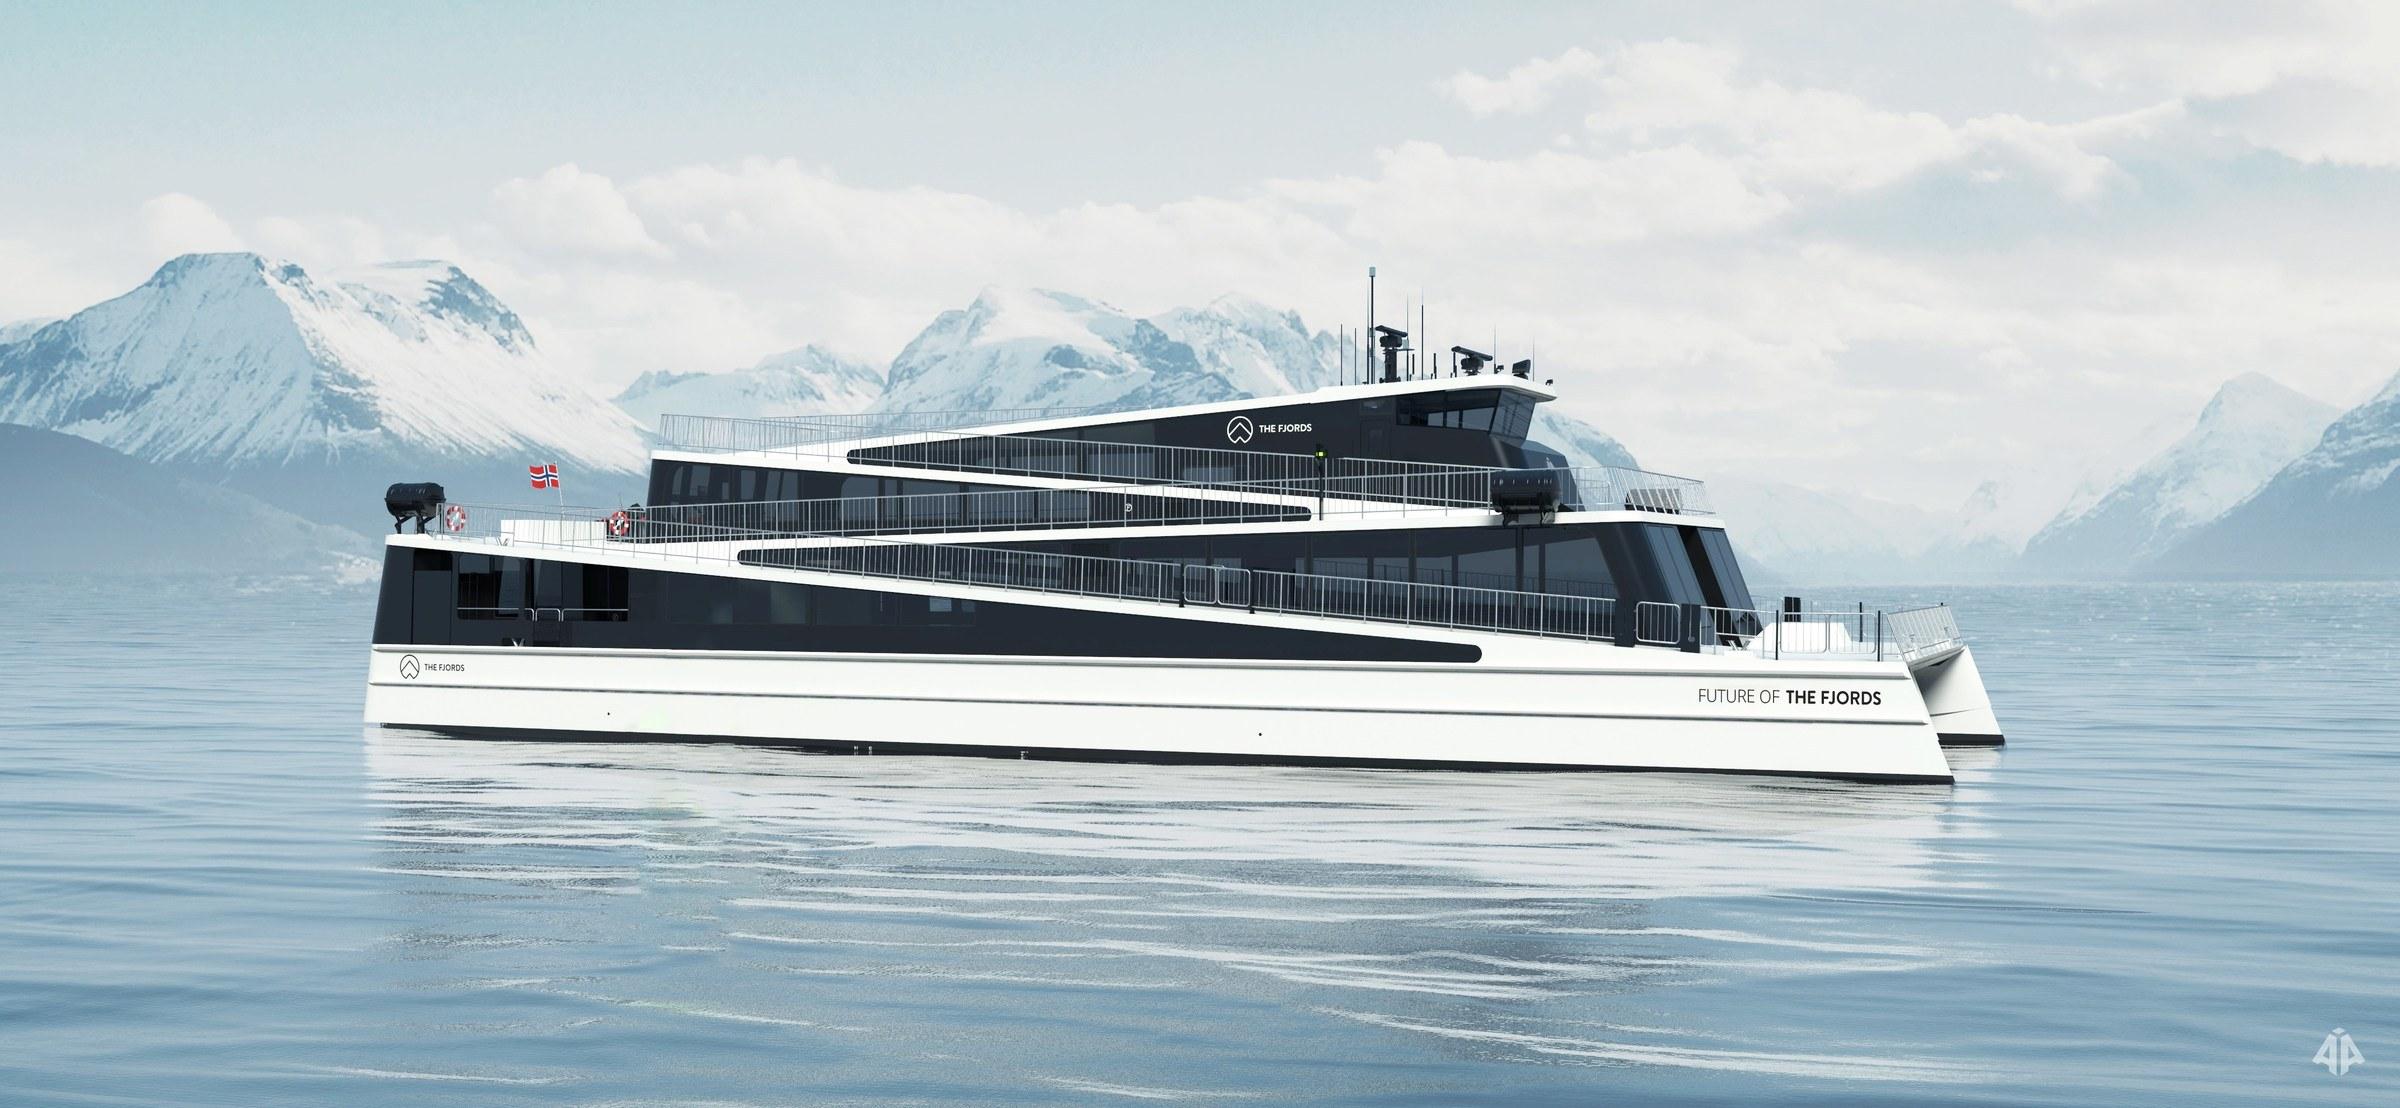 futureofthefjords-render-1.jpg